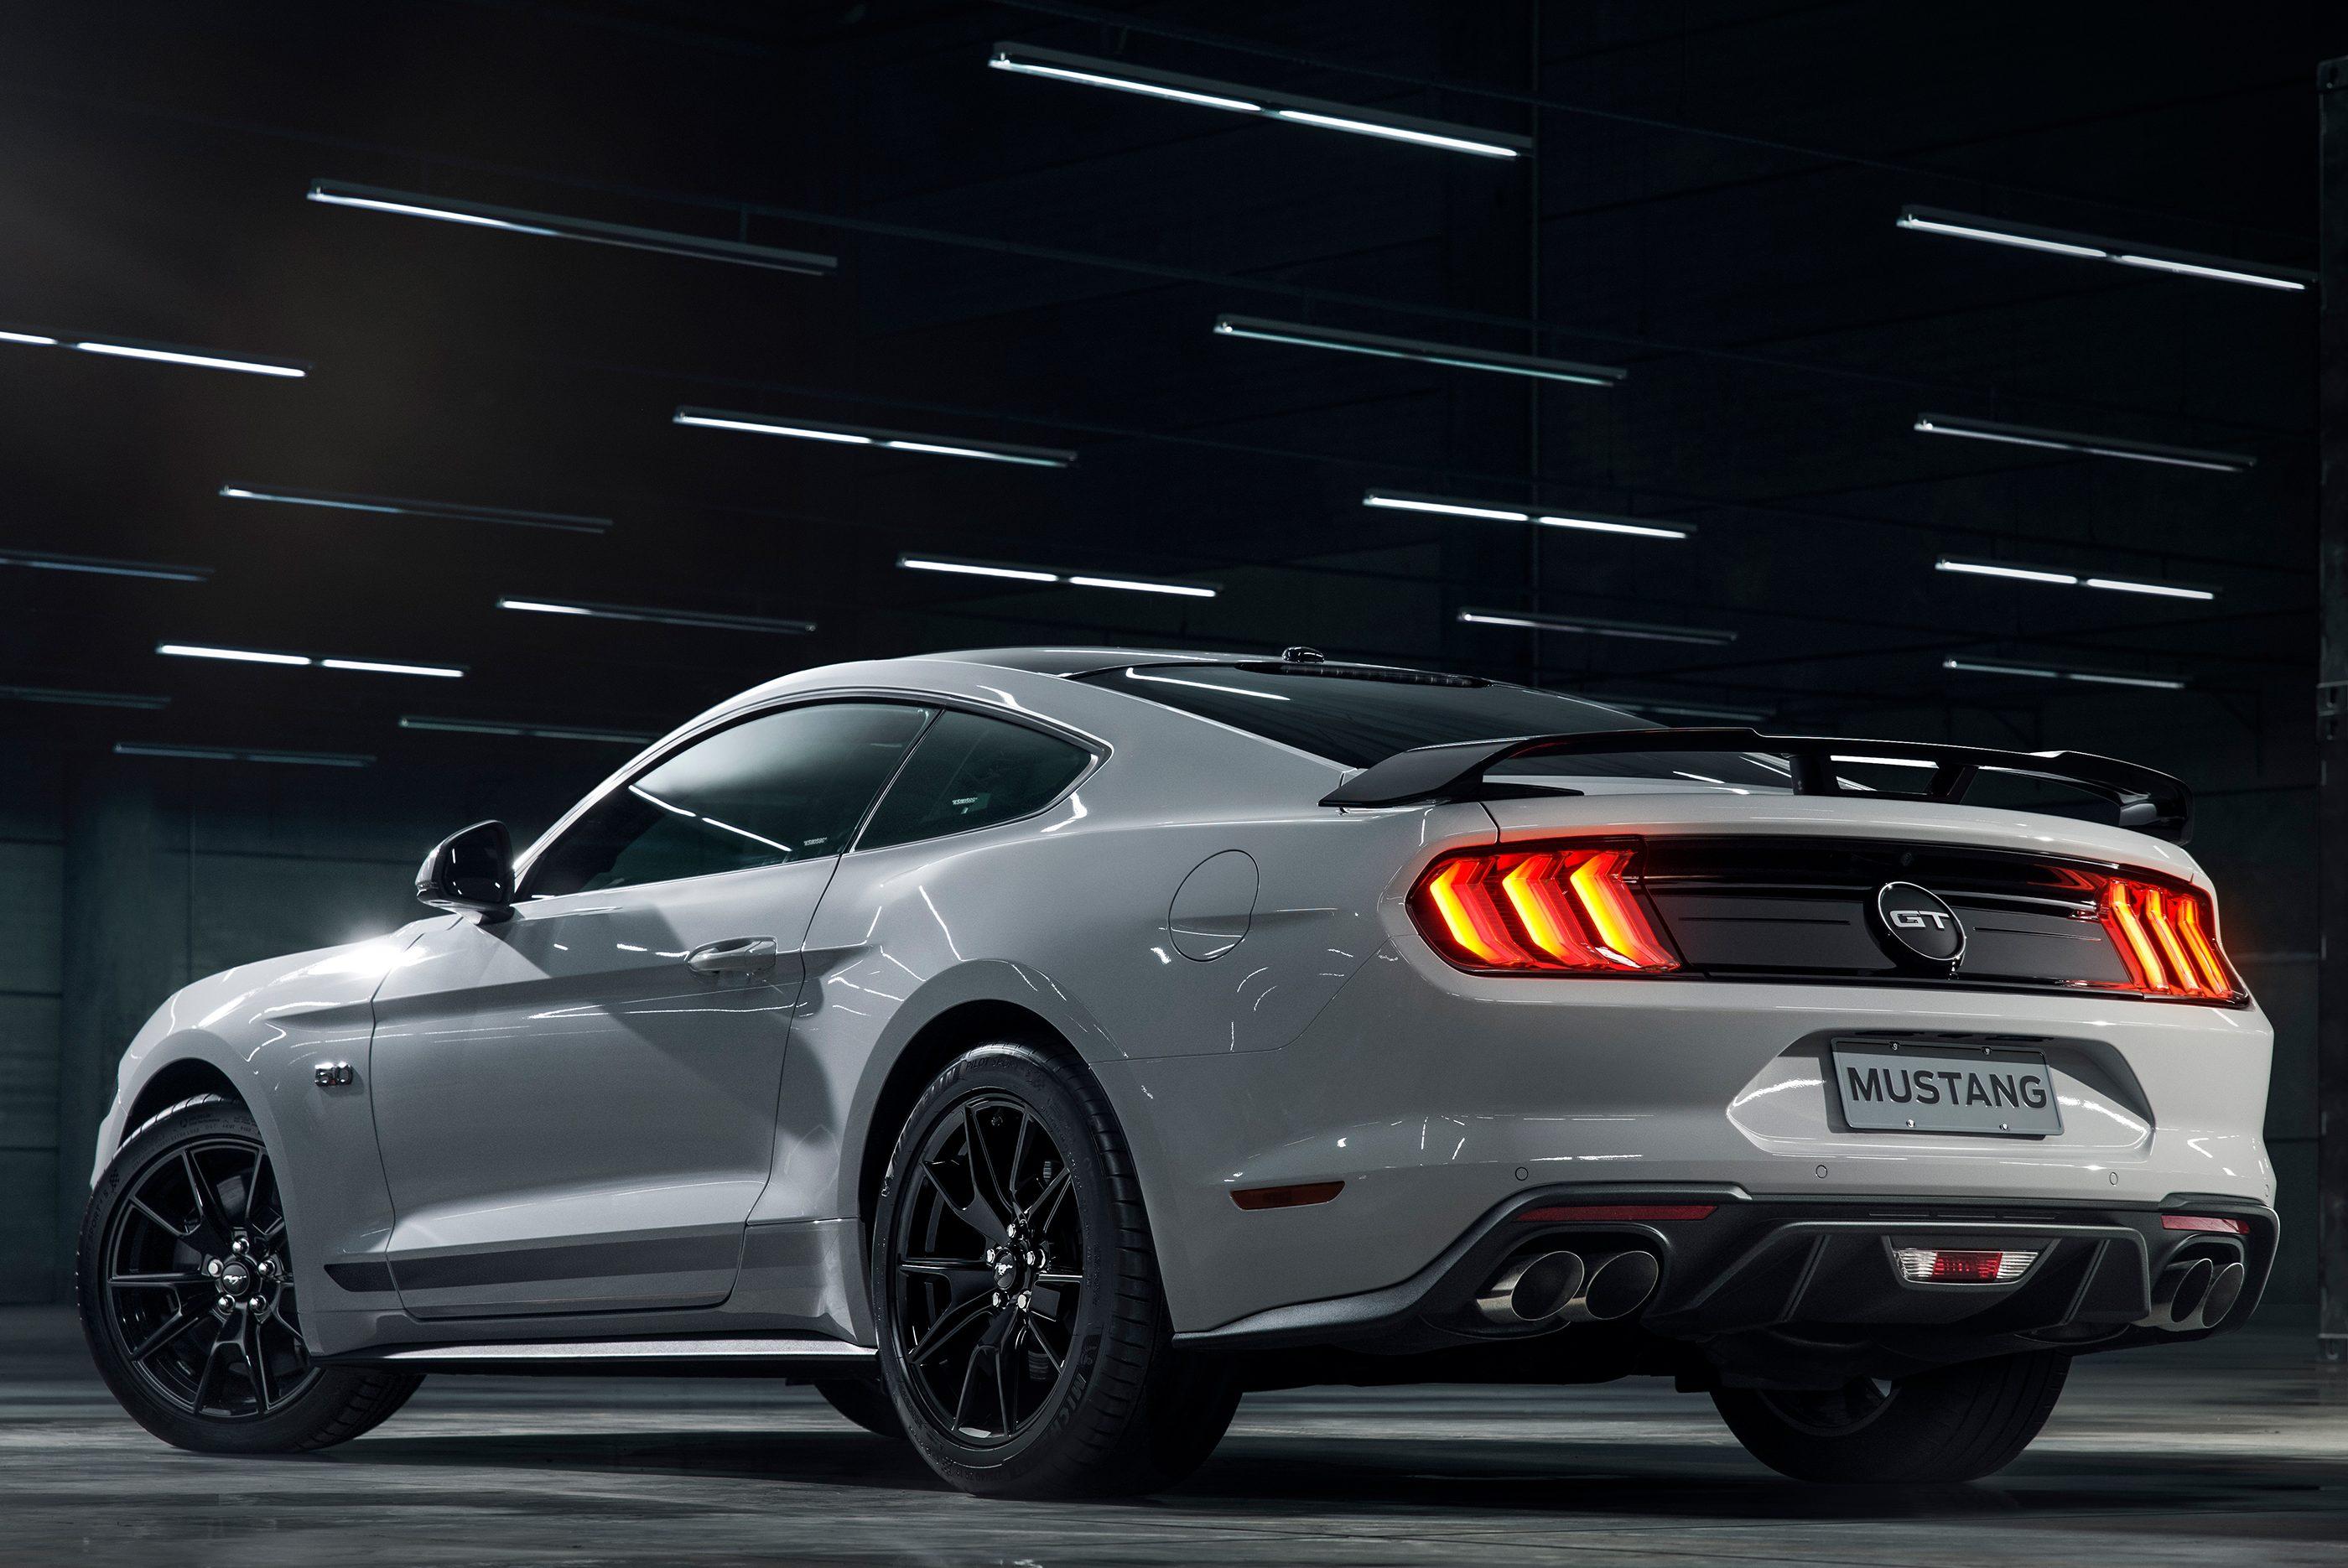 Ford Mustang Black Shadow Chega Para Substituir A Atual Versao Gt Premium Quatro Rodas